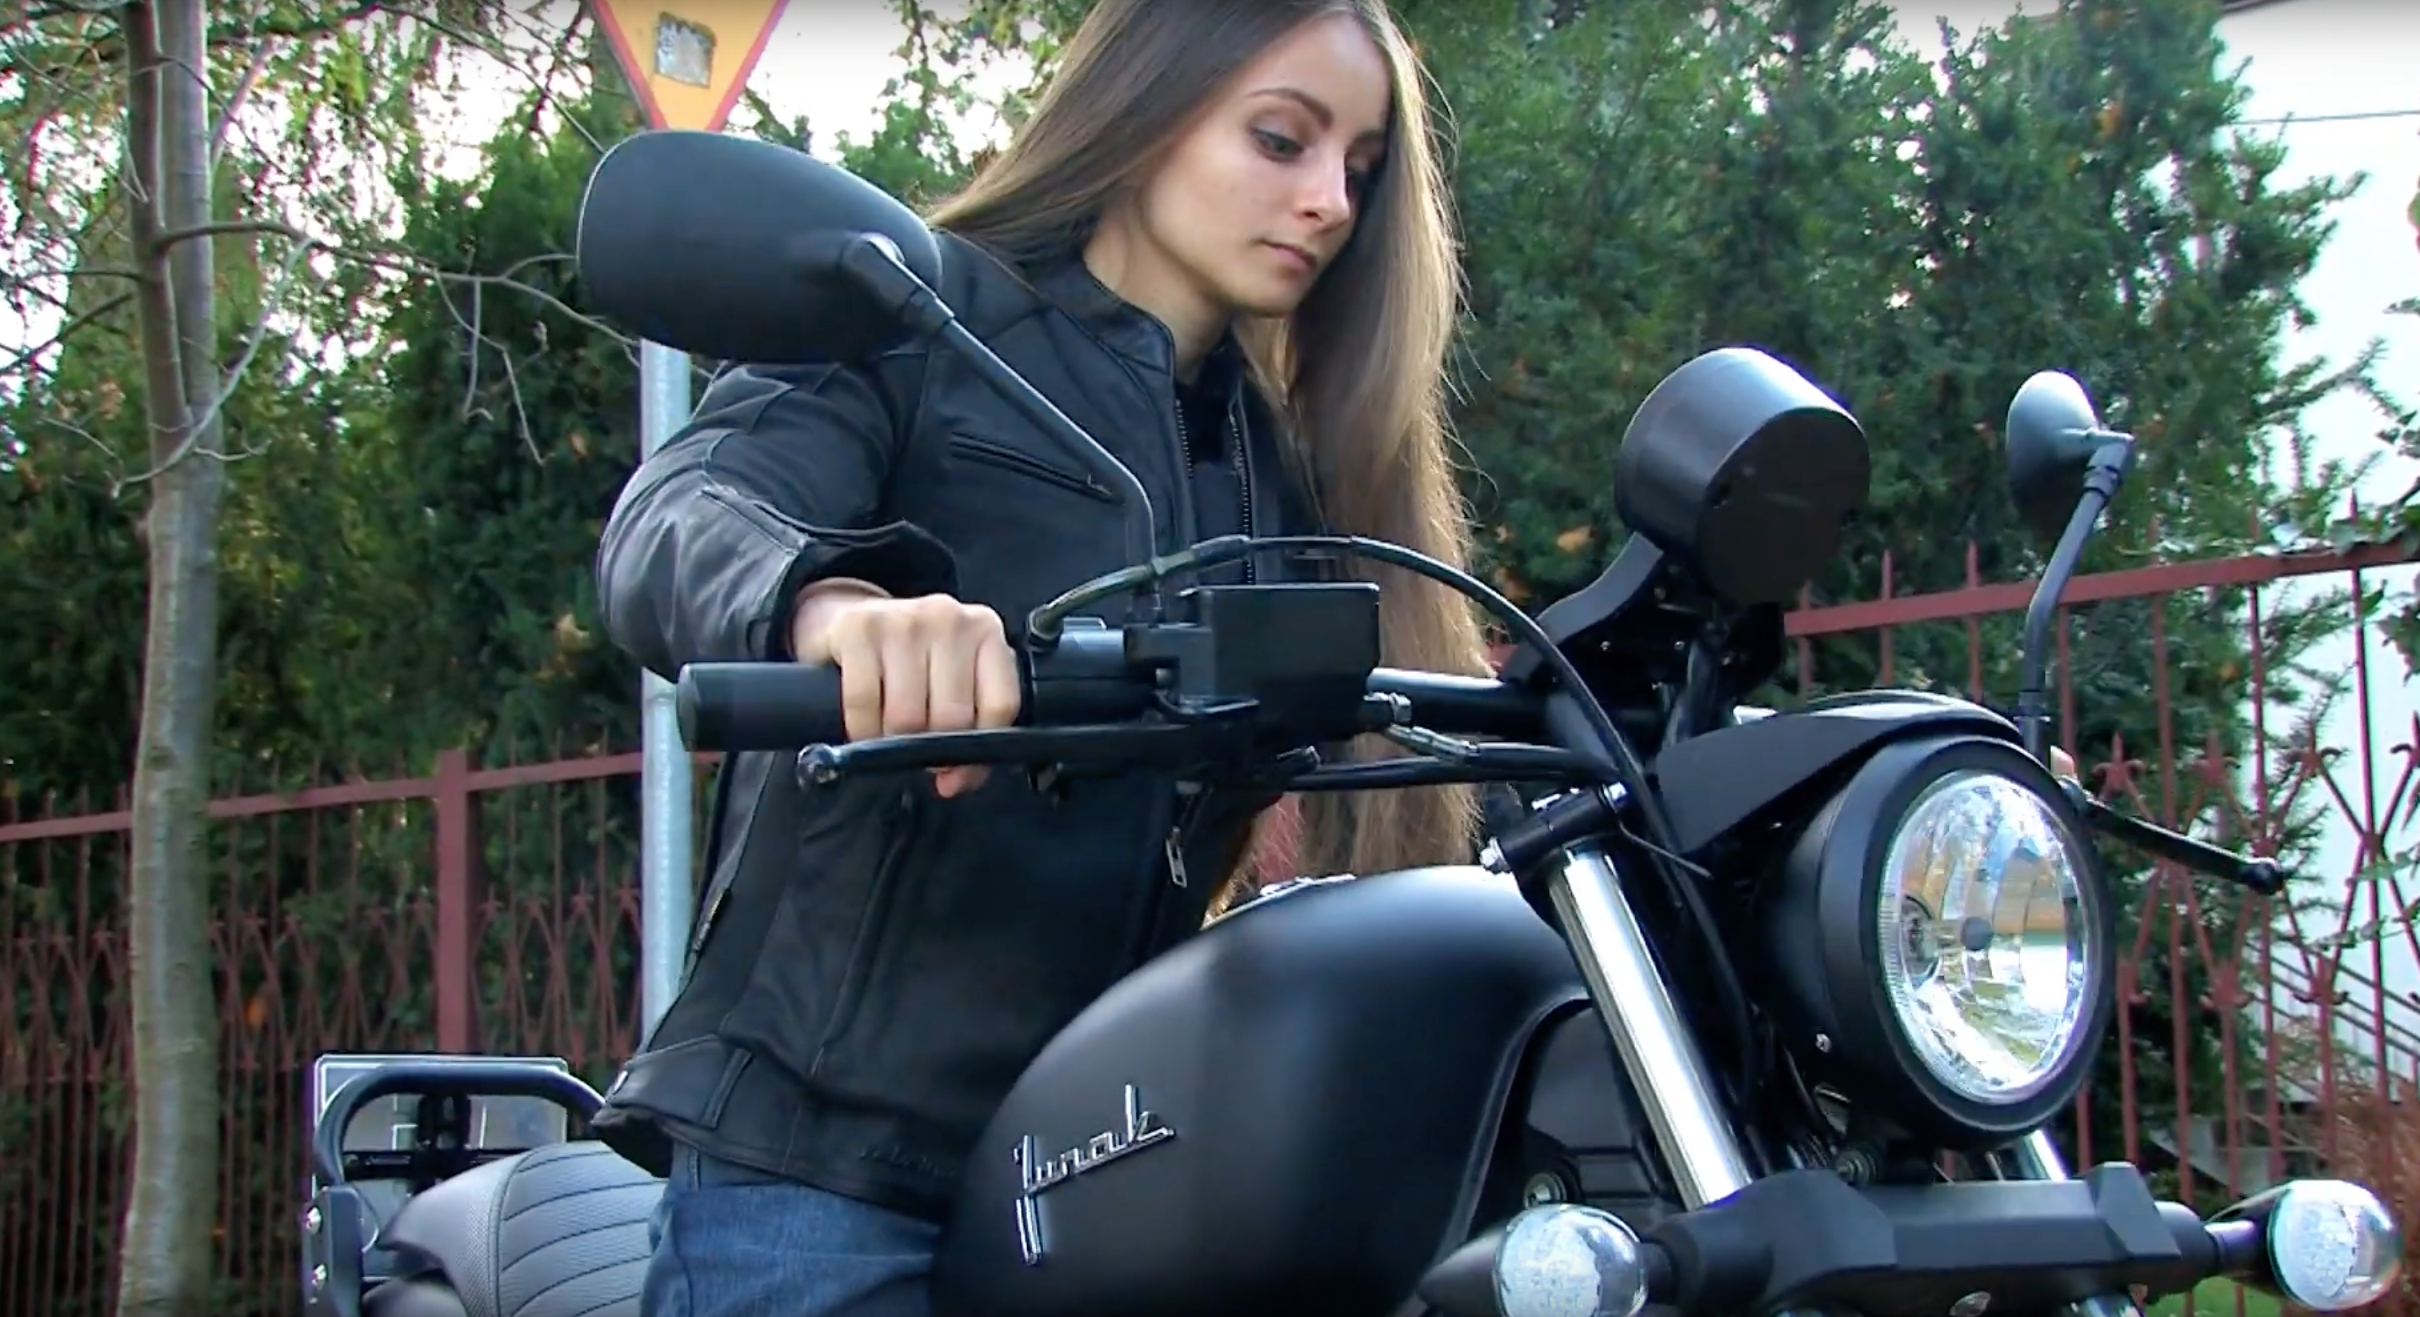 Junak M12 Vintage 125: Motocykl dla kobiety z prawem jazdy B?